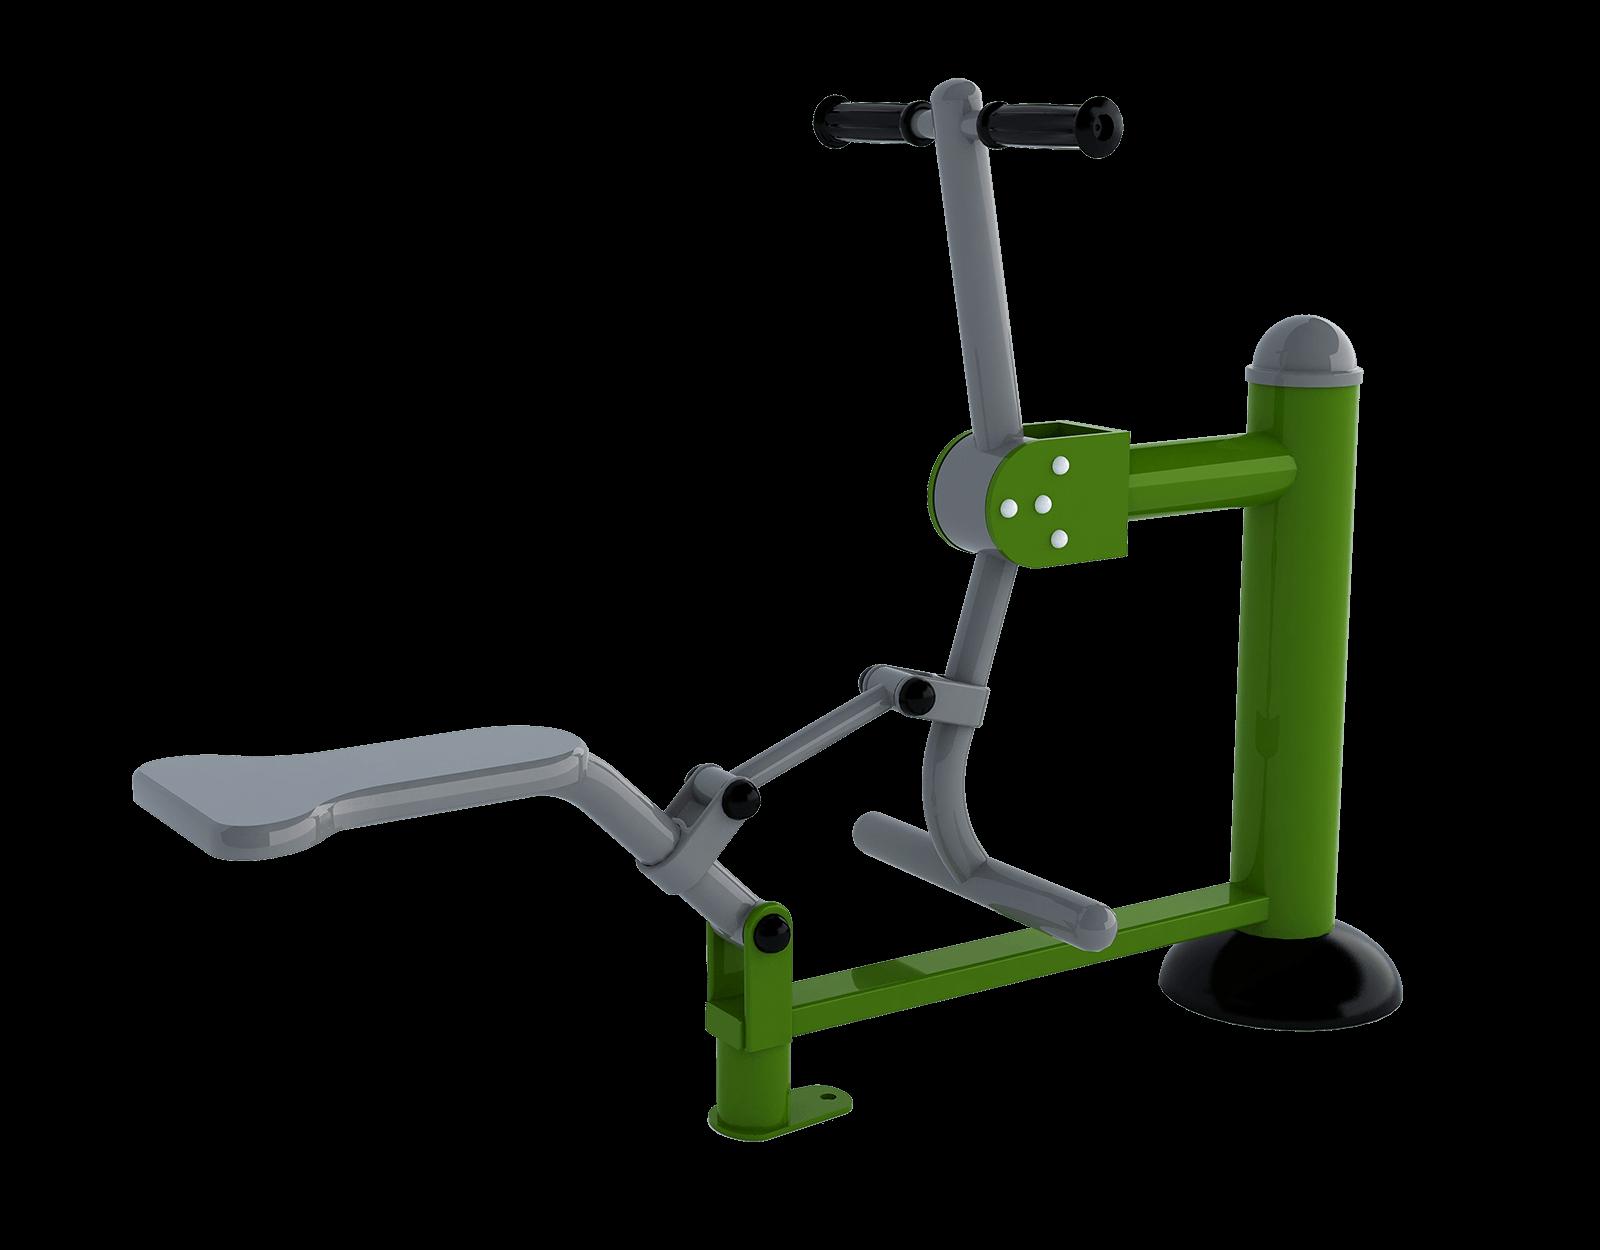 Plac street workout - jeździec